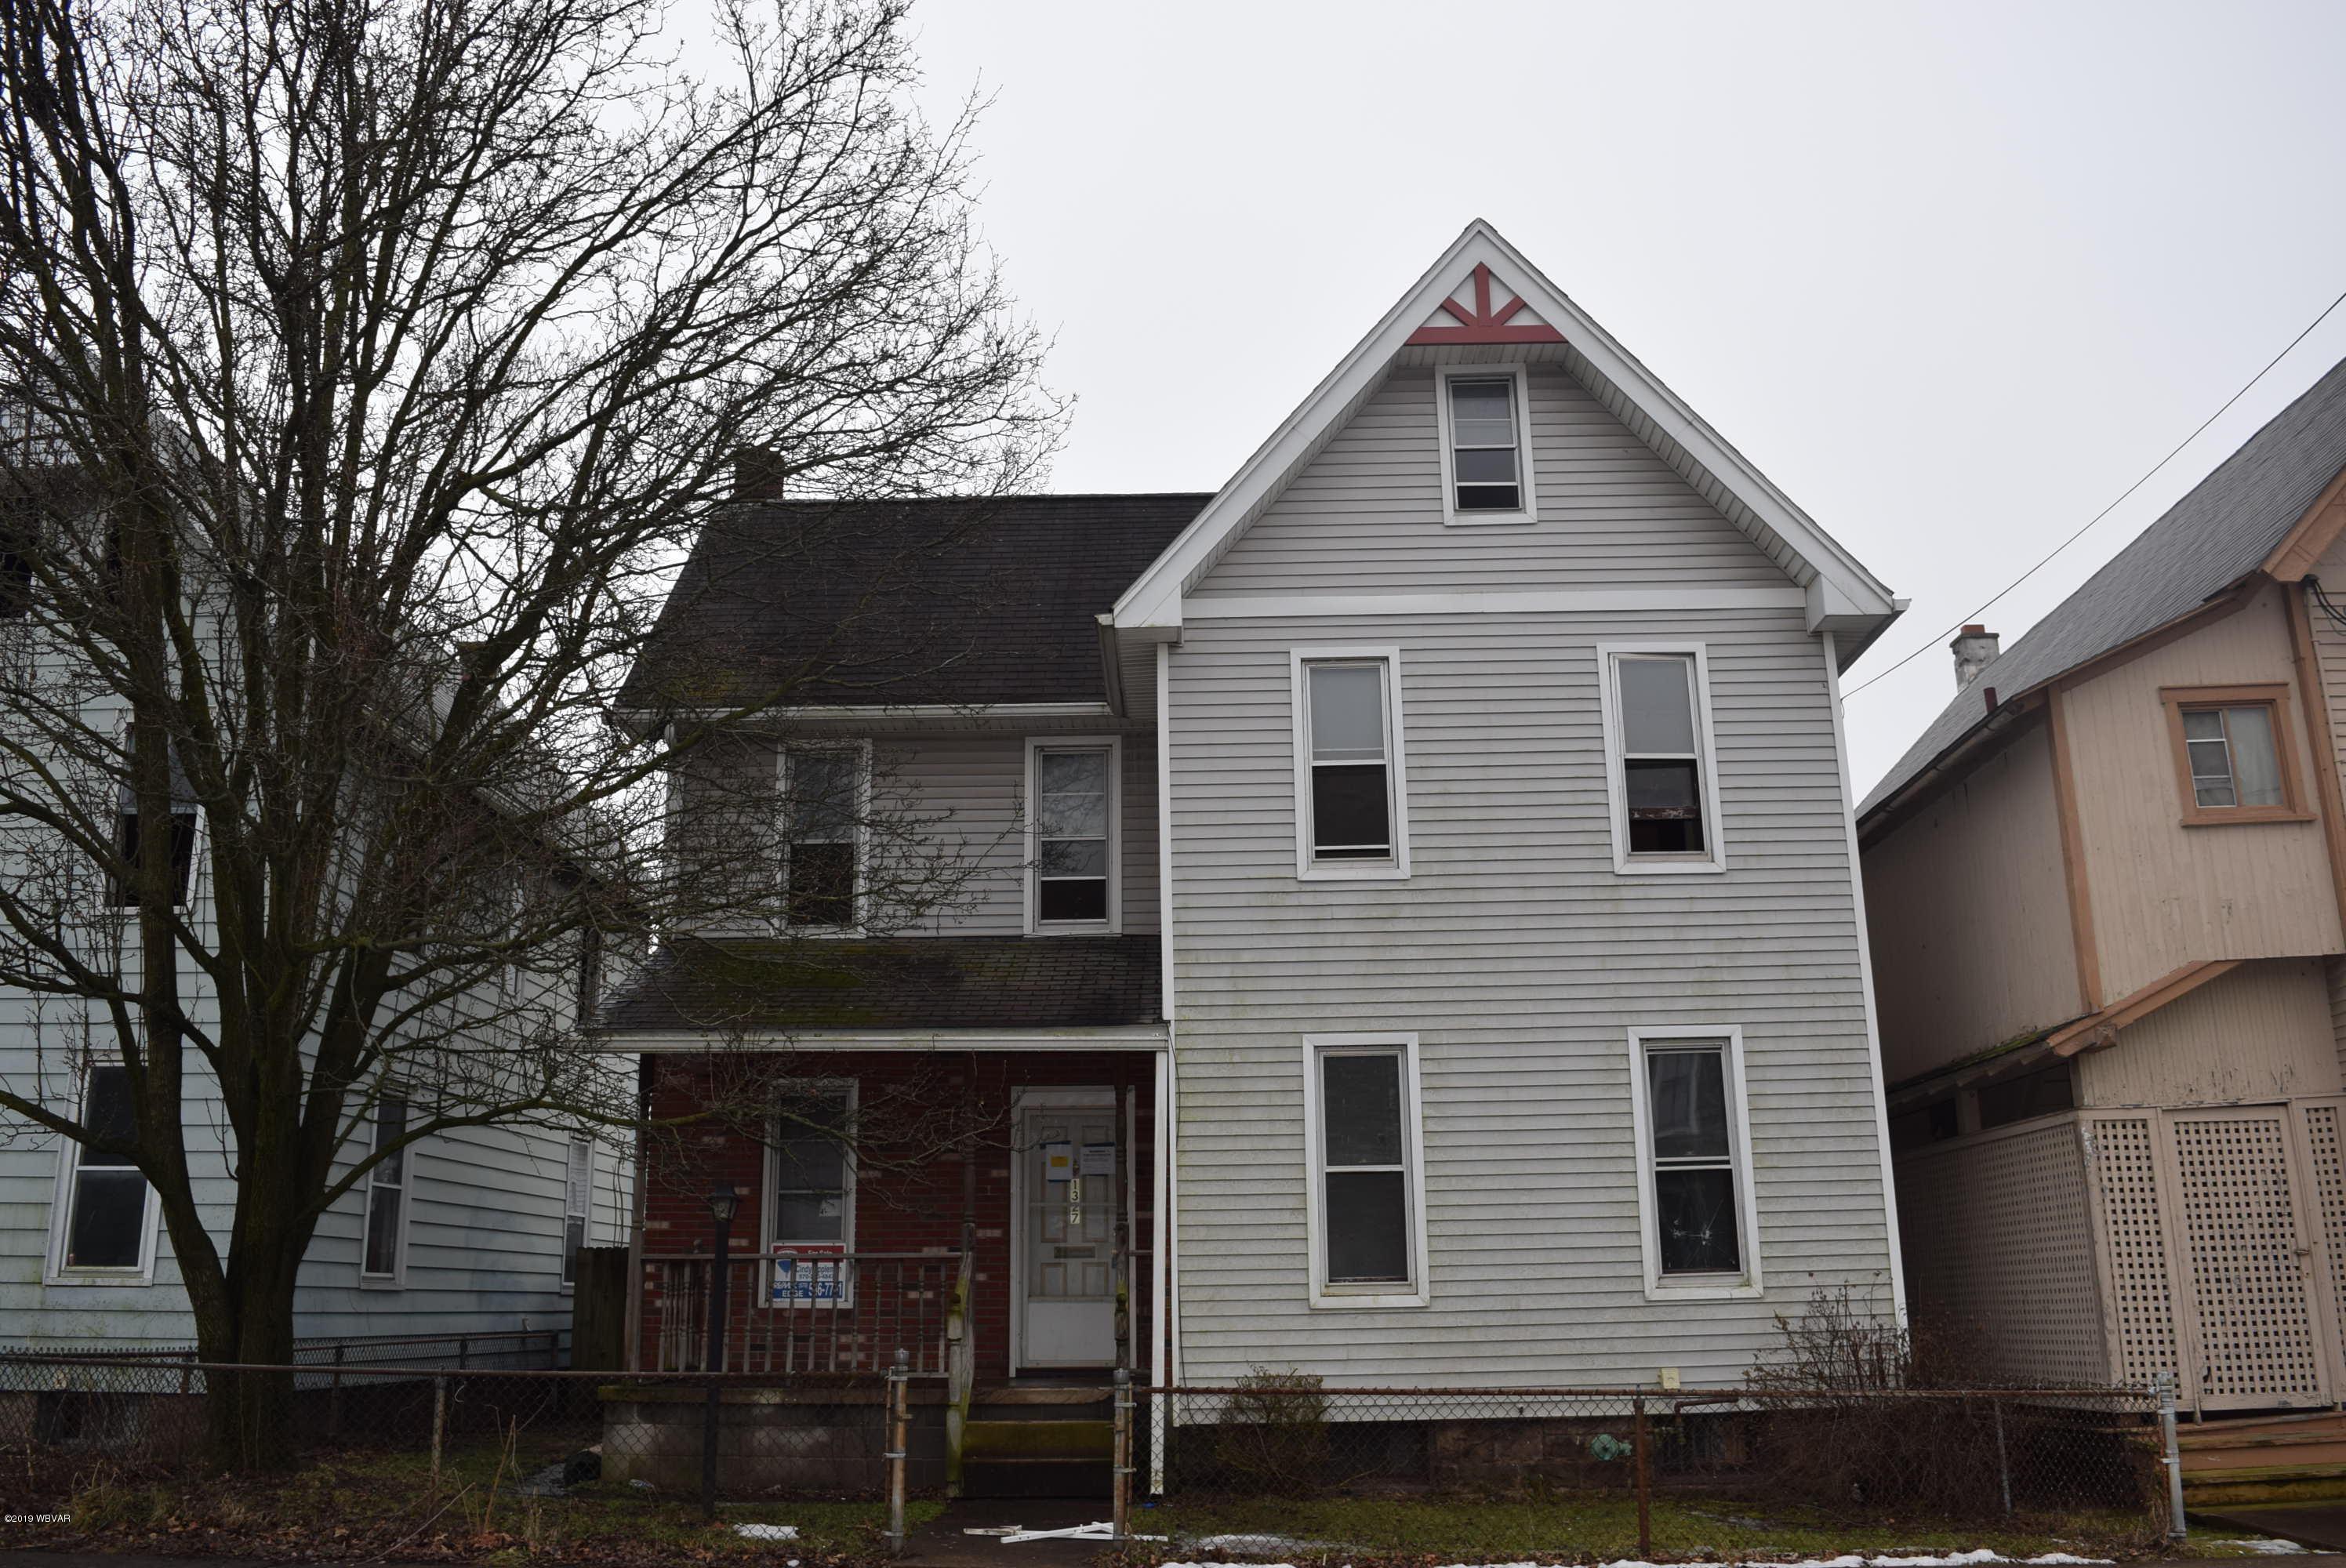 1327 SCOTT STREET,Williamsport,PA 17701,3 Bedrooms Bedrooms,2 BathroomsBathrooms,Residential,SCOTT,WB-86390